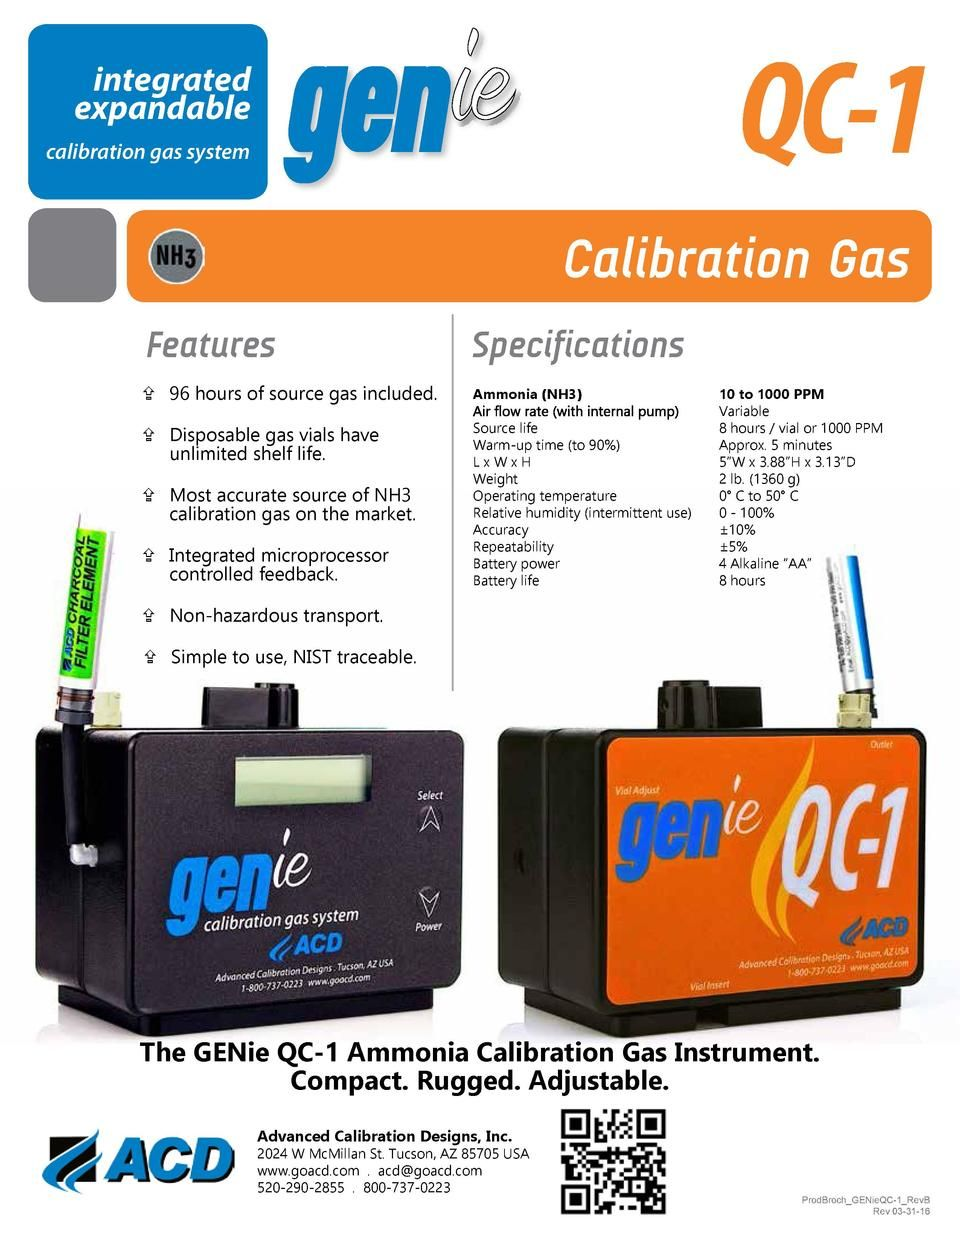 Genie Qc 1 Brochure